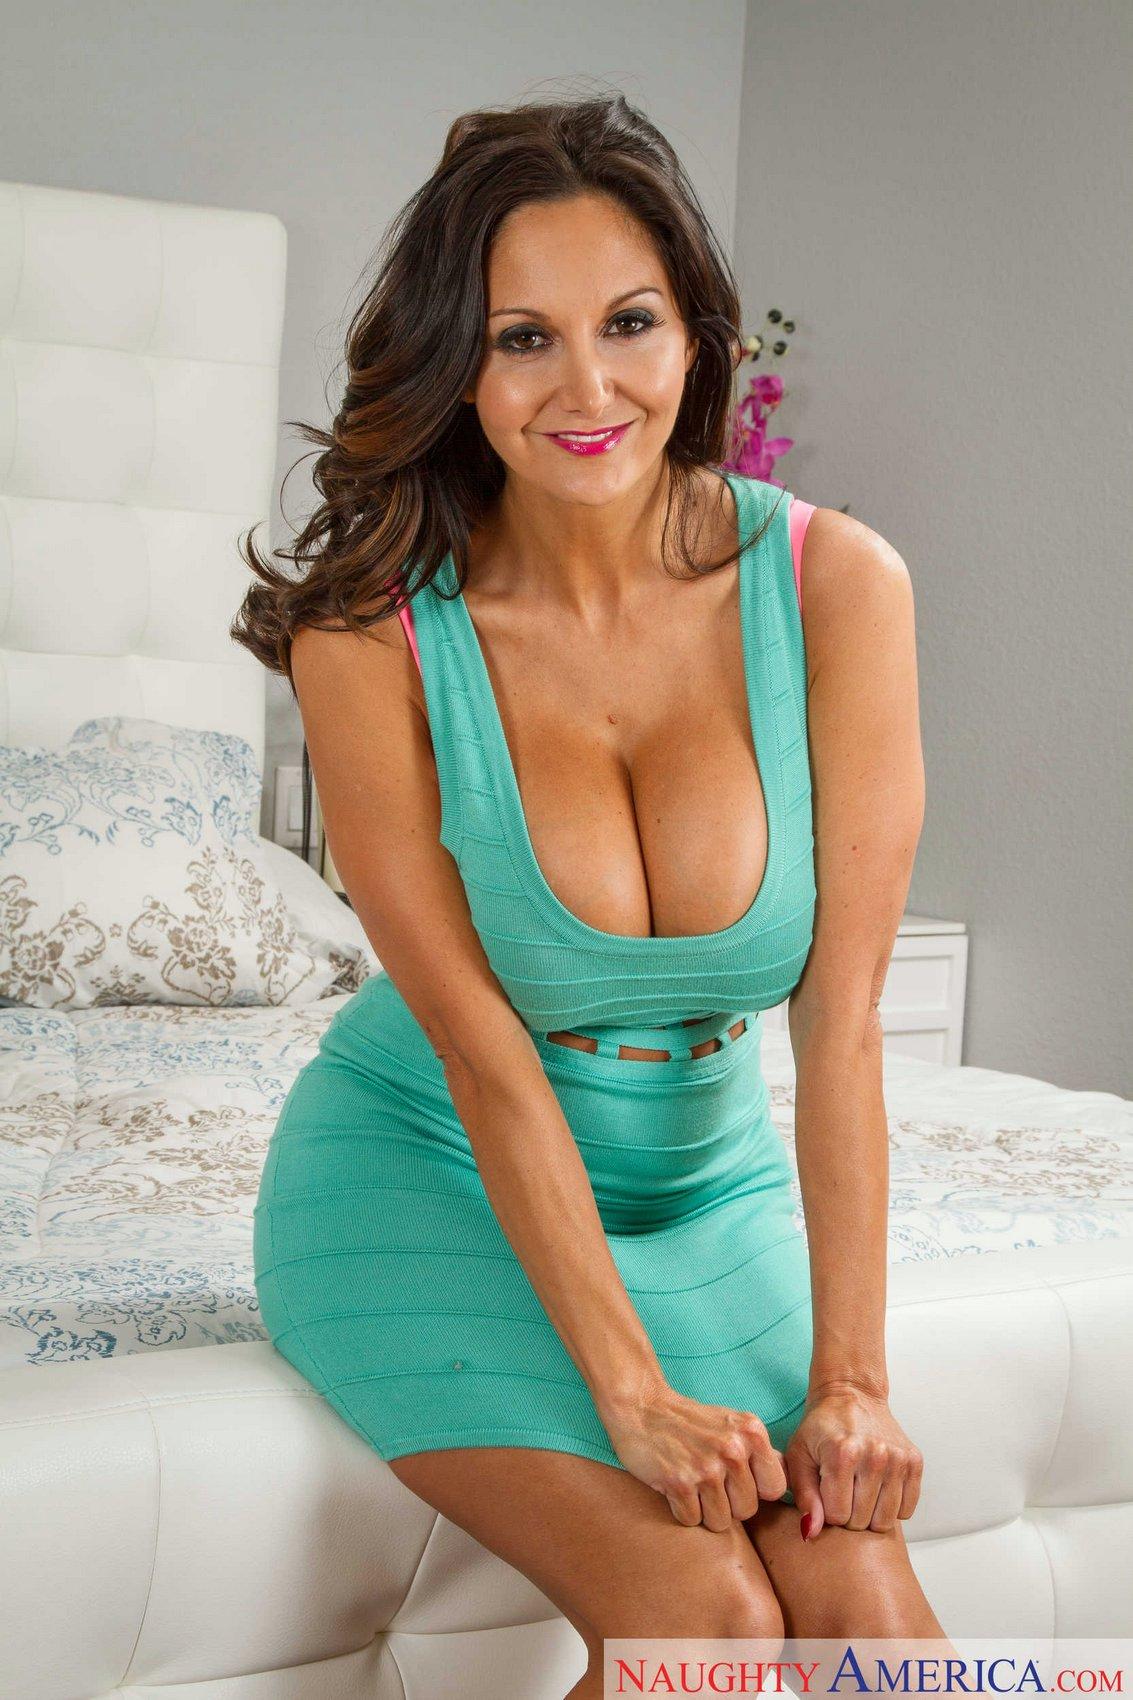 Sexy Latina Milf Pics